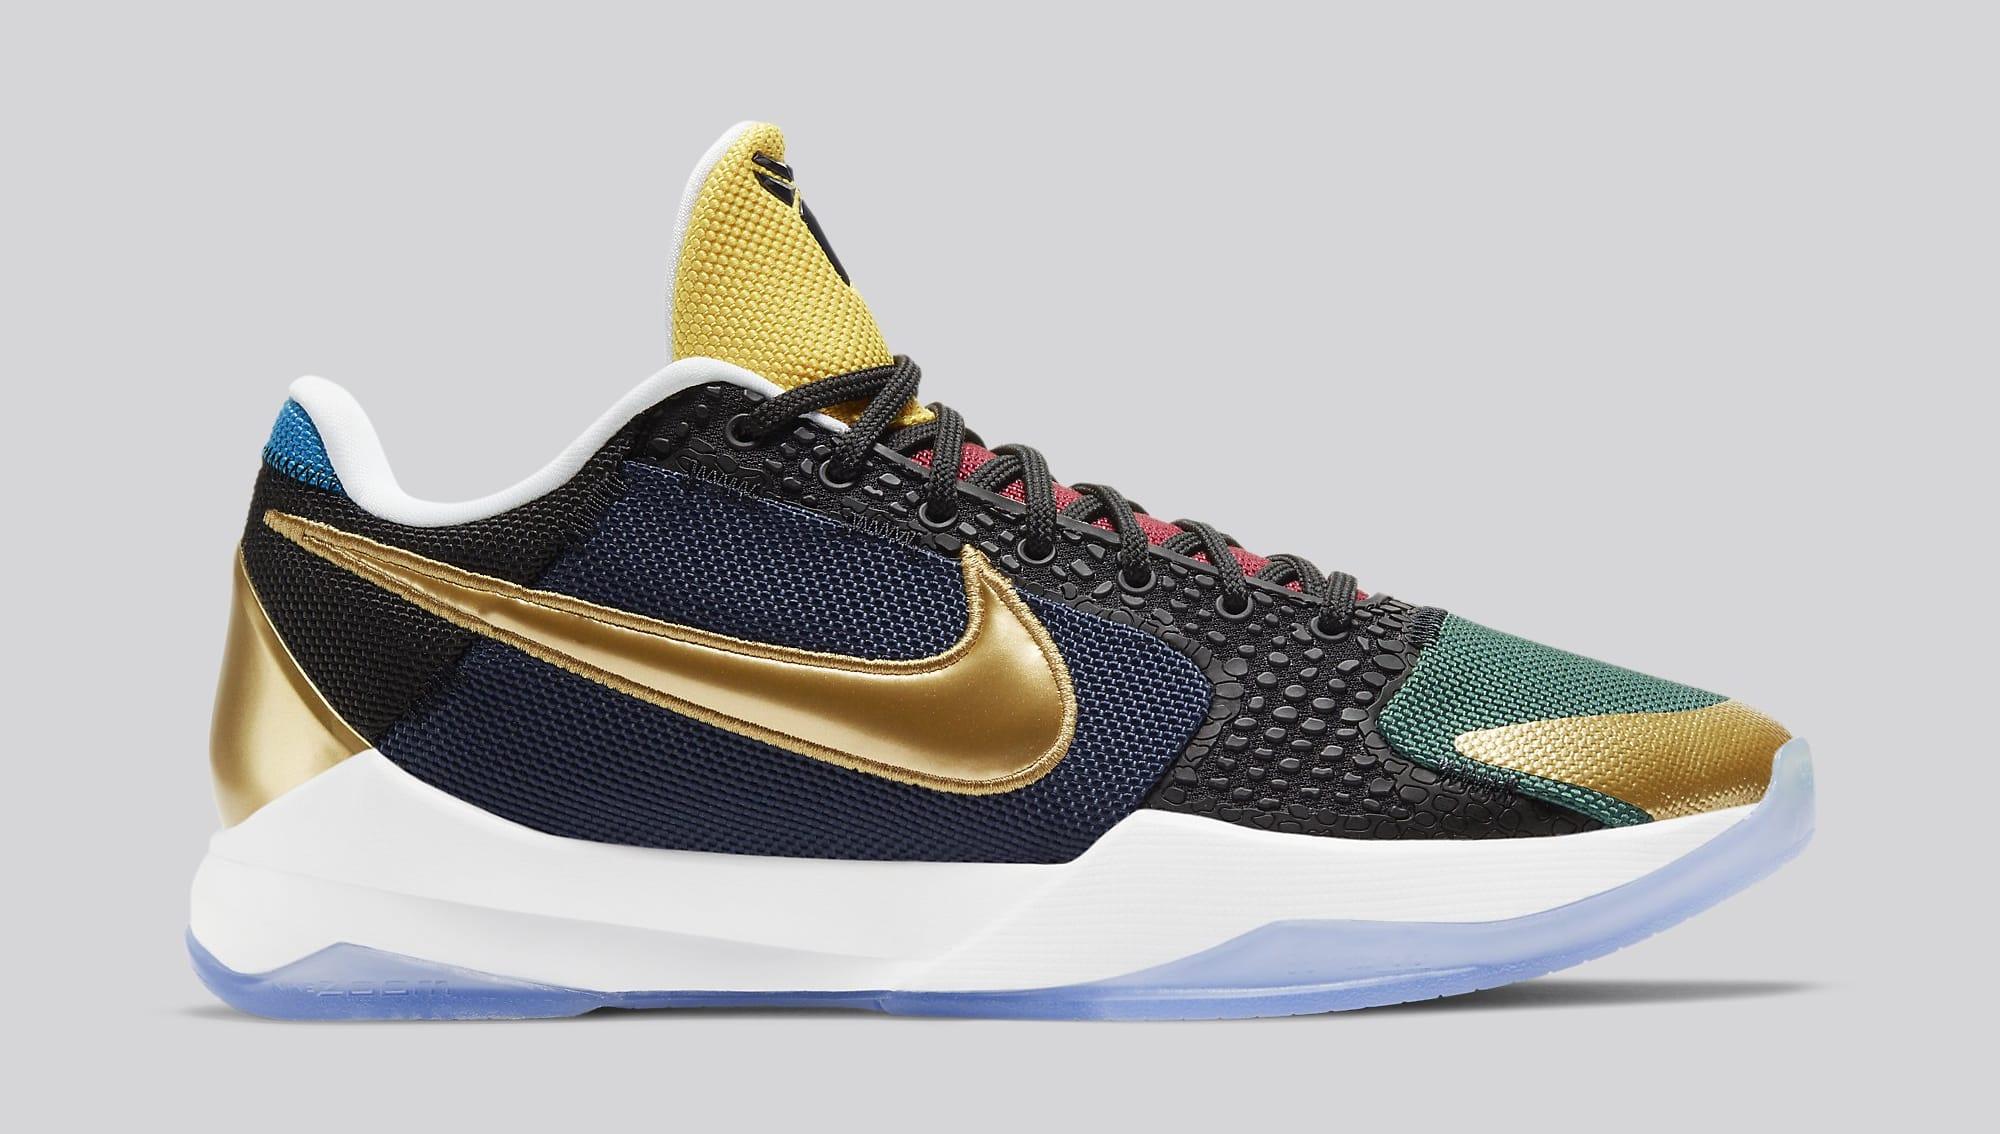 Undefeated x Nike Kobe 5 Protro 'Dirty Dozen' DB5551-900 Lateral